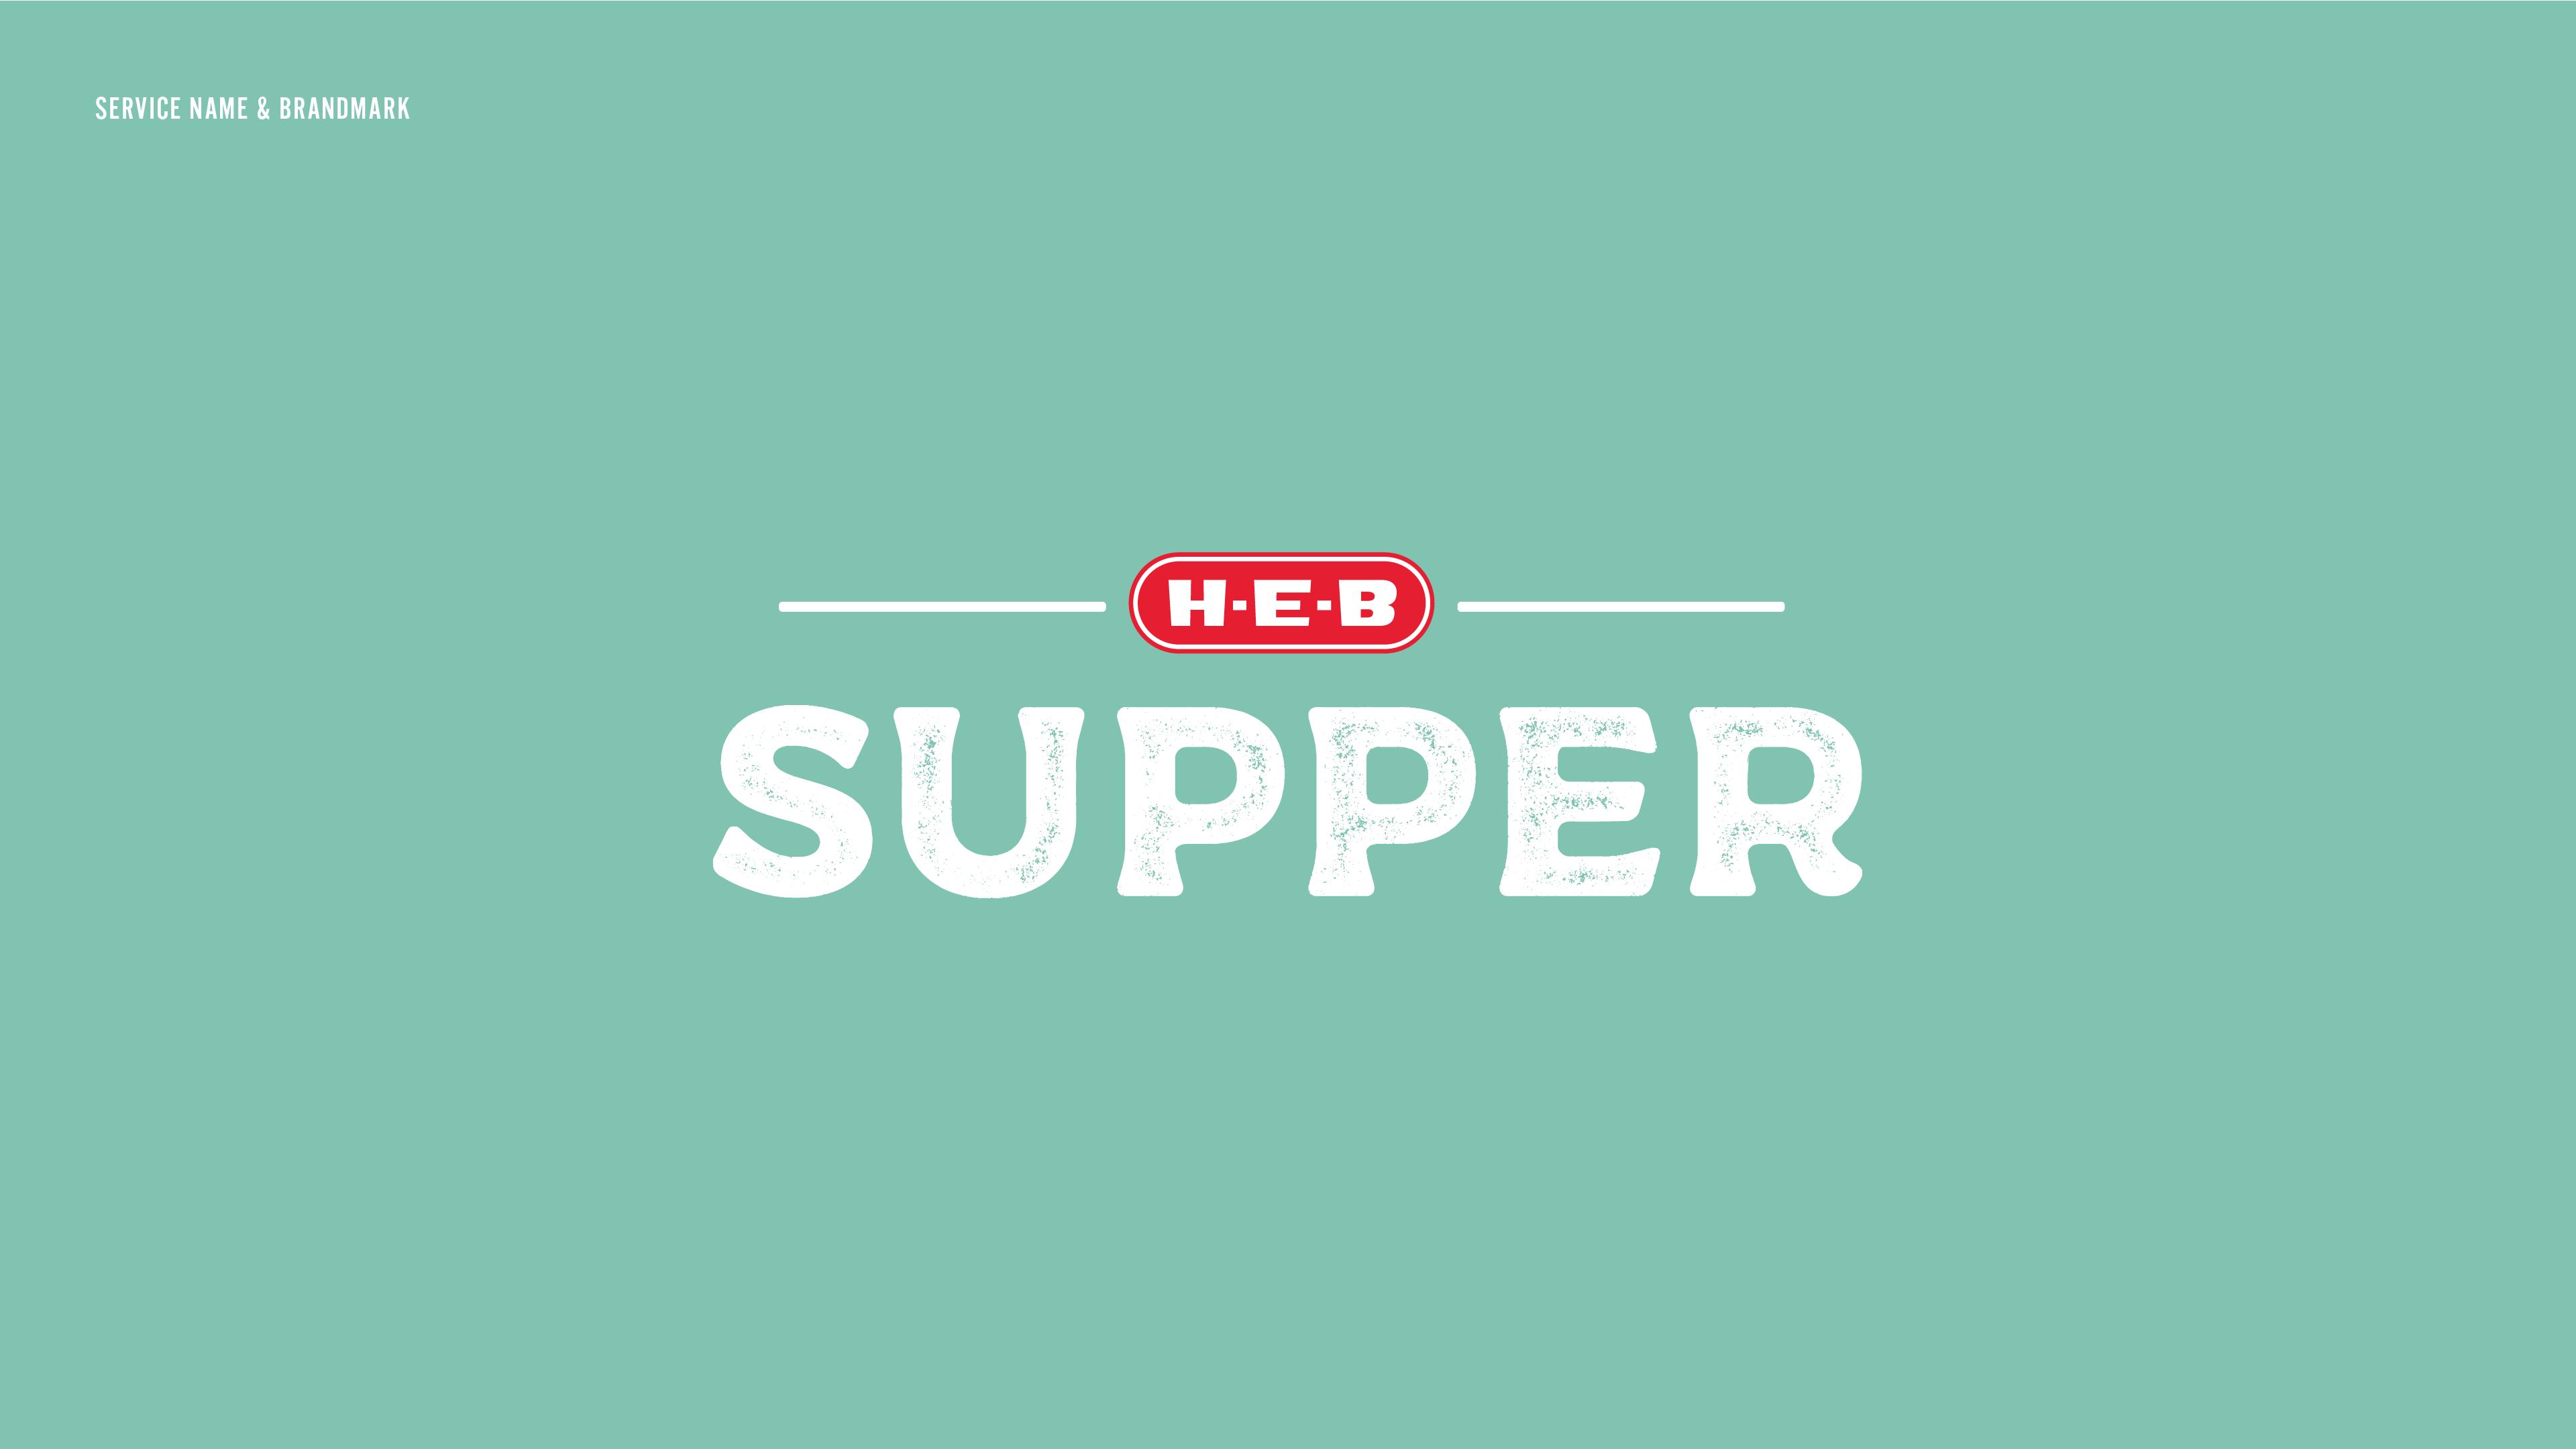 heb_supper_2.0_real_tealArtboard-1-copy-5@2x